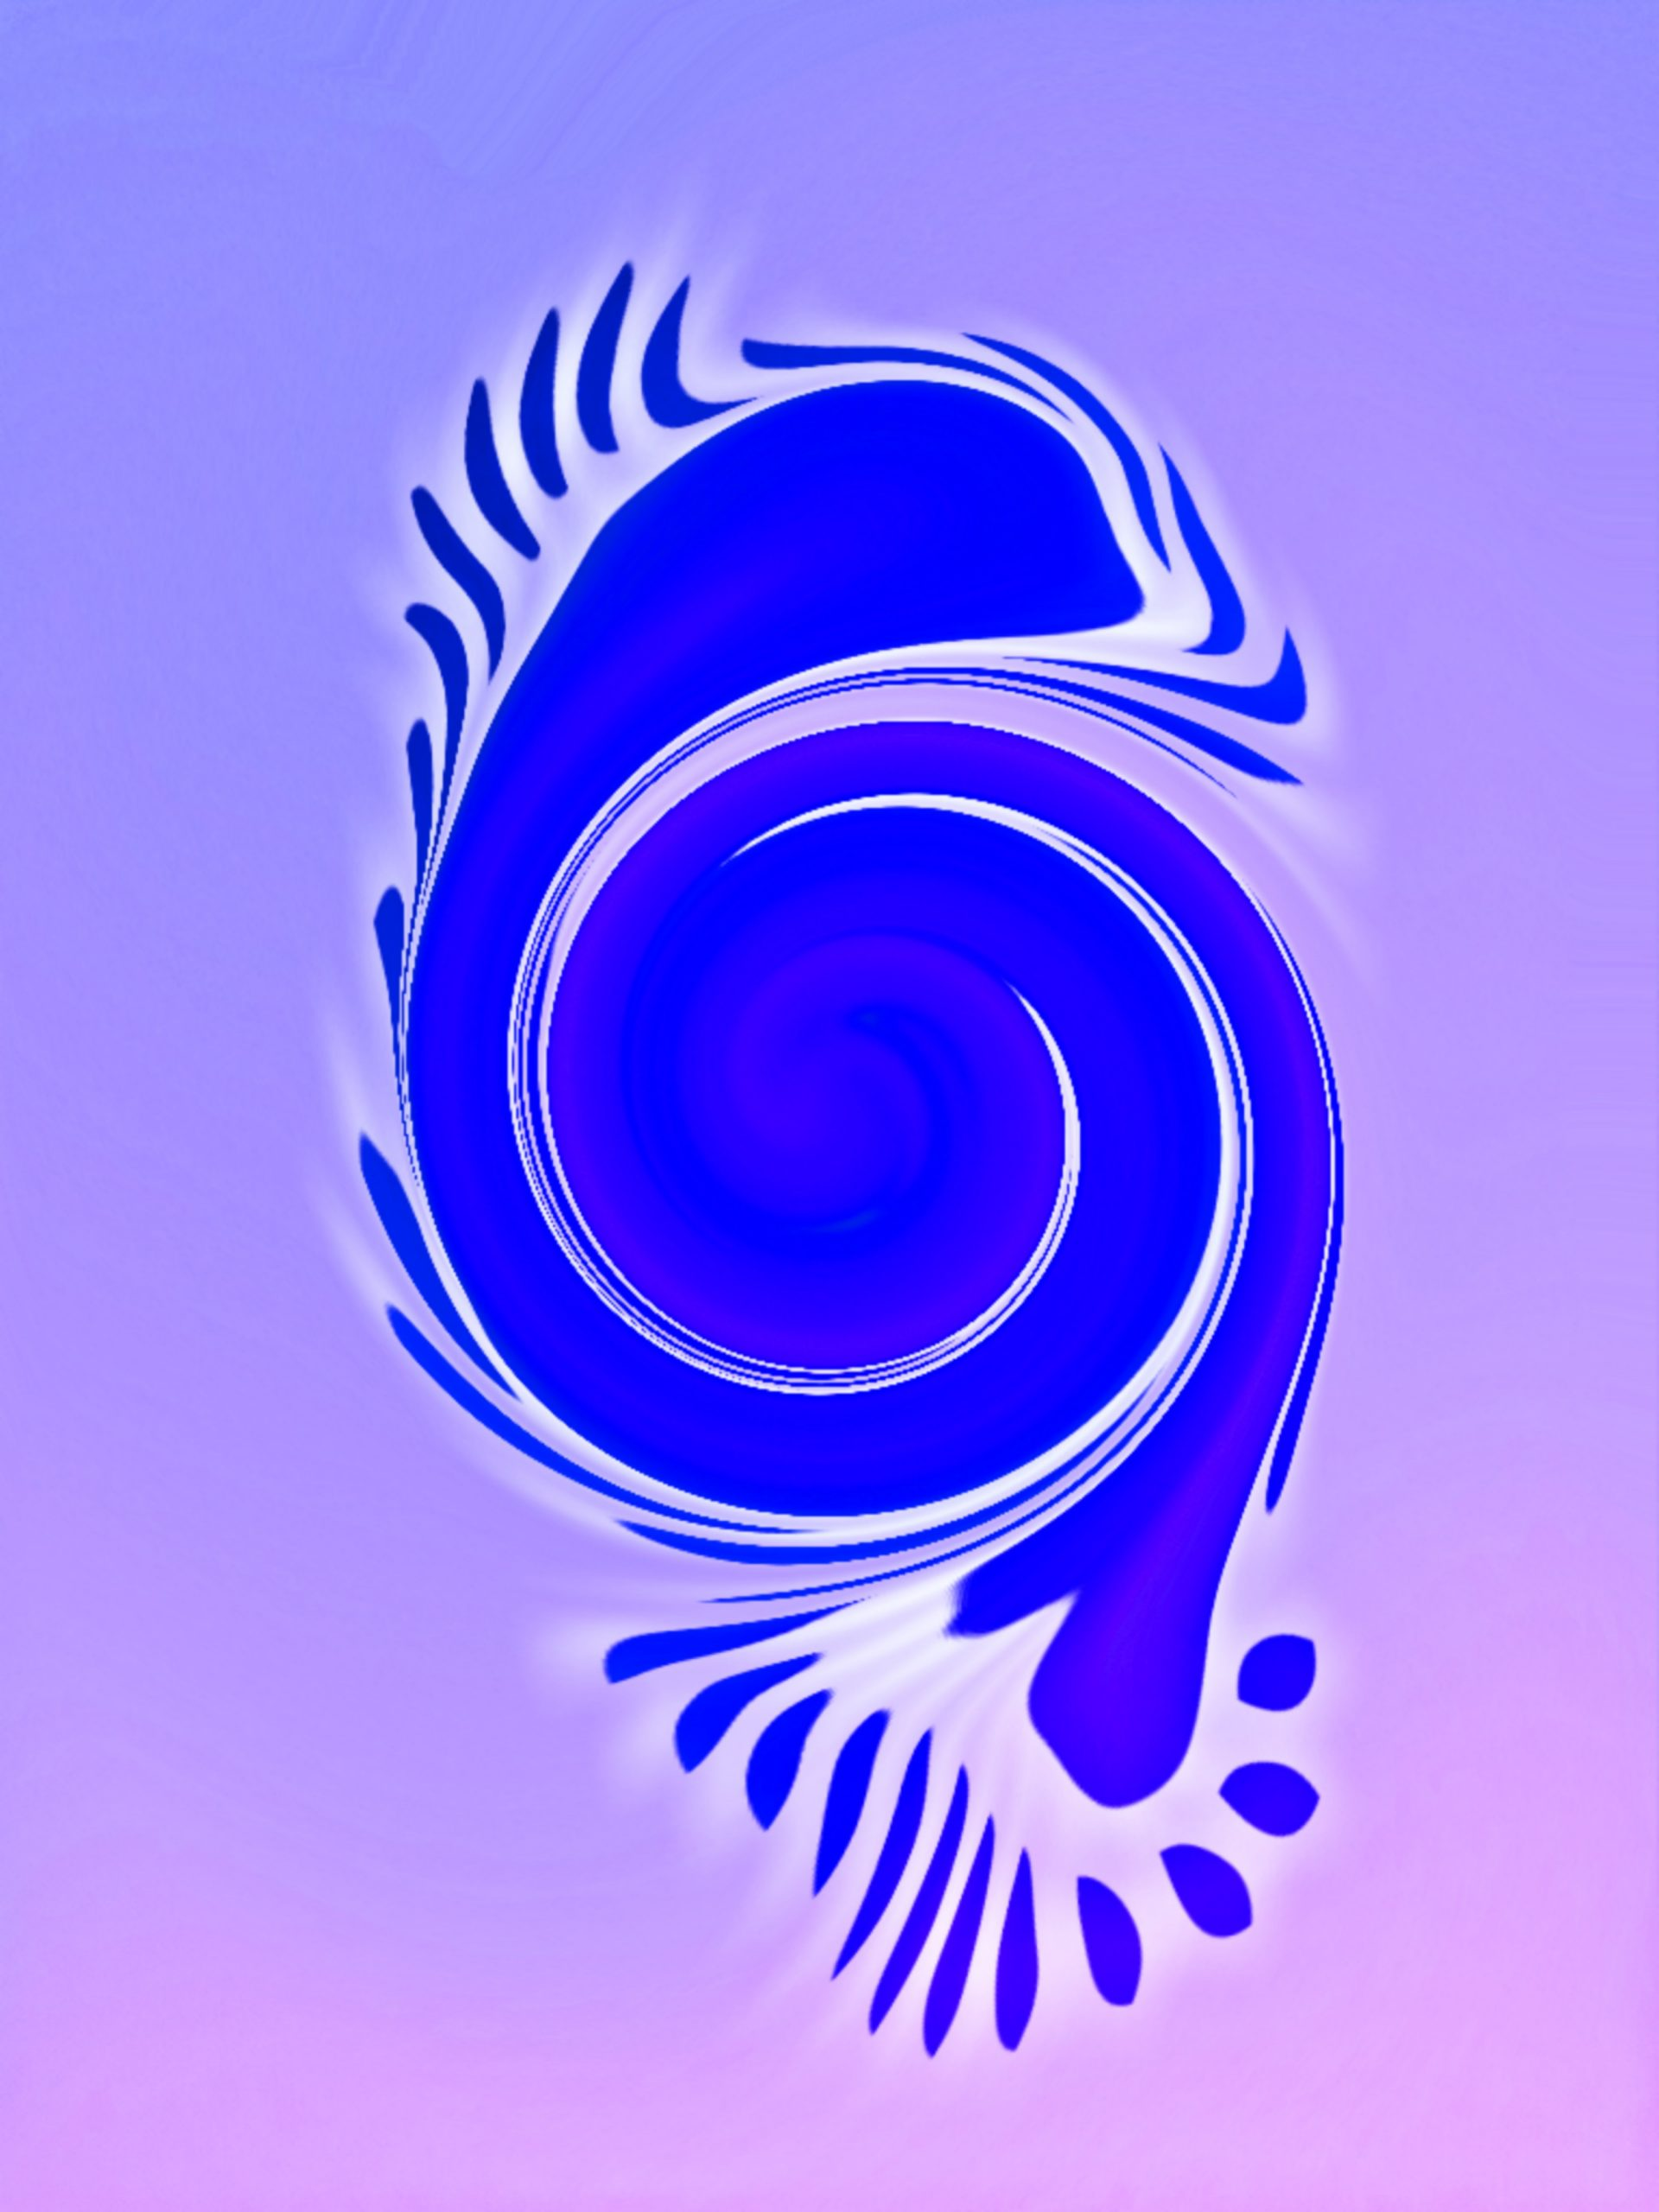 A design